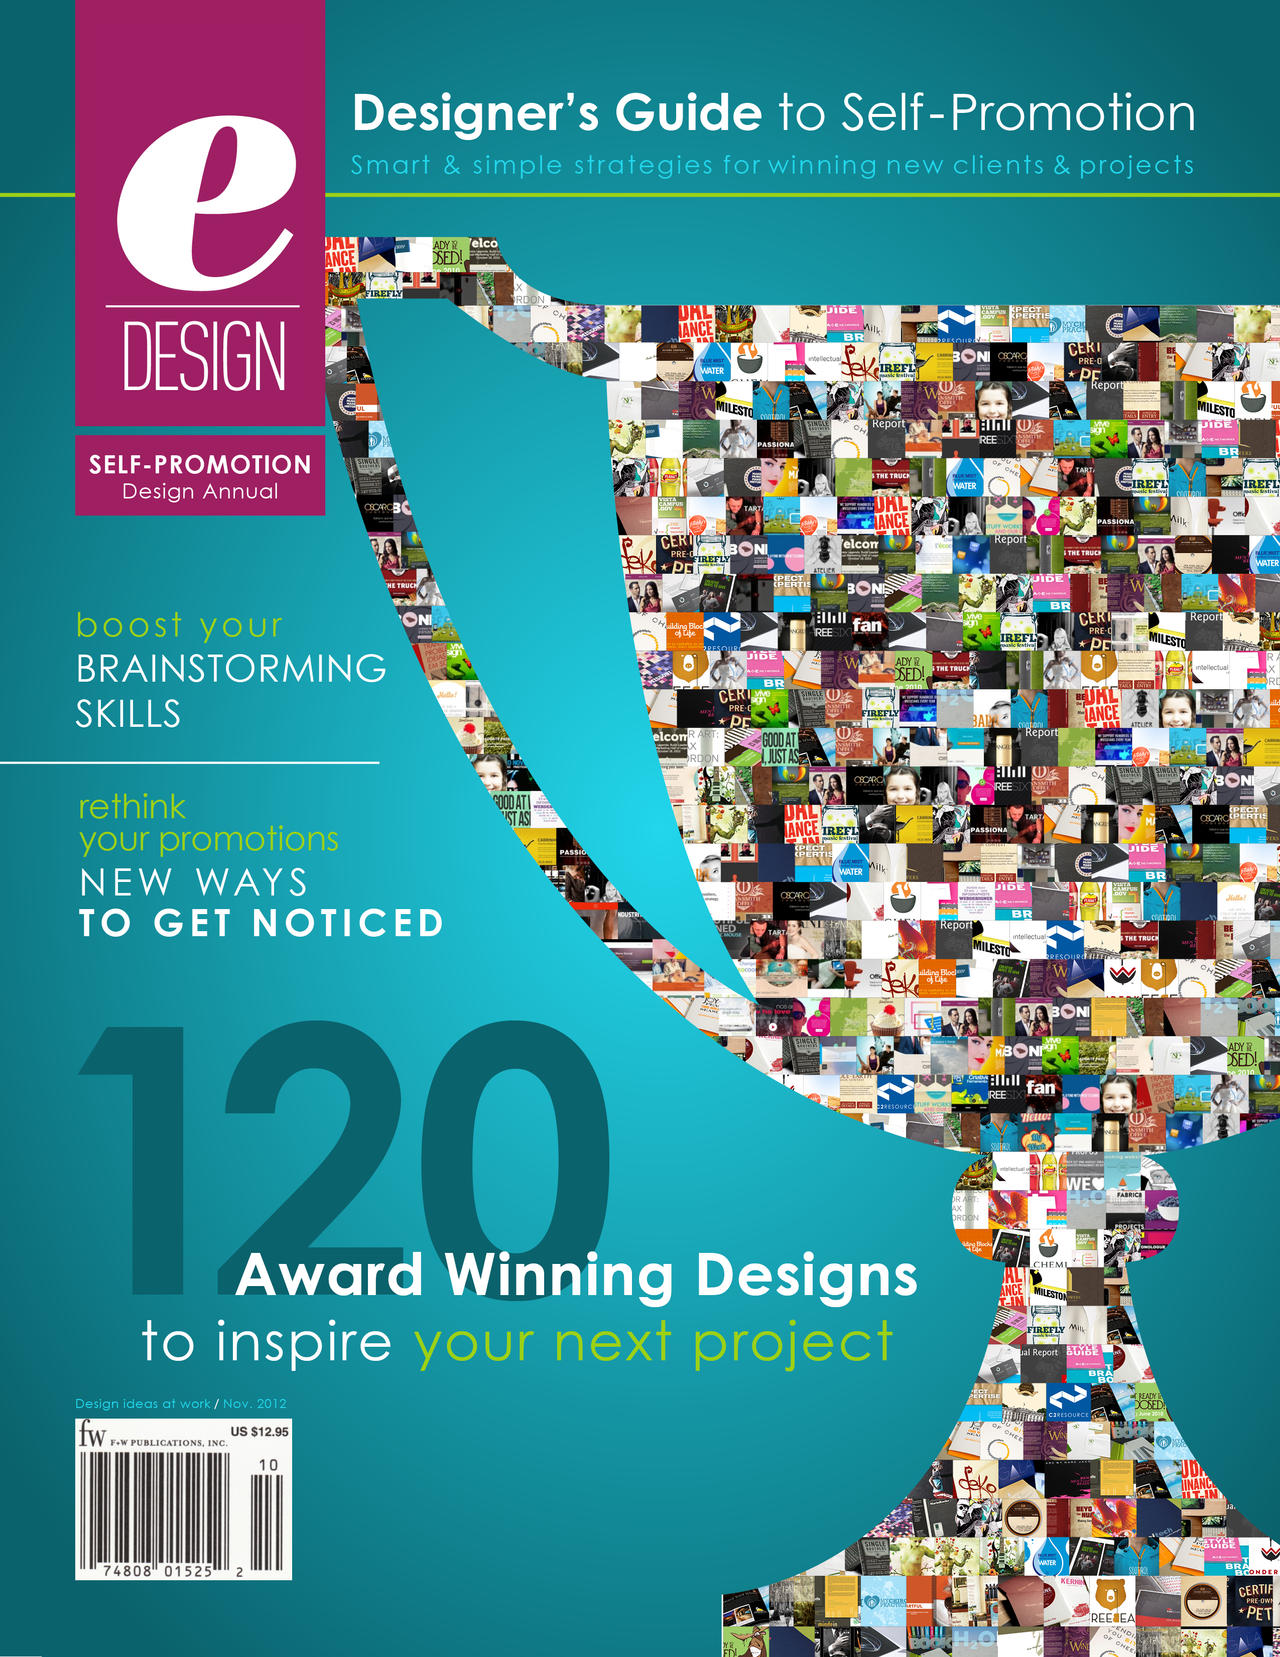 magazine cover design by jkrout555 on deviantart